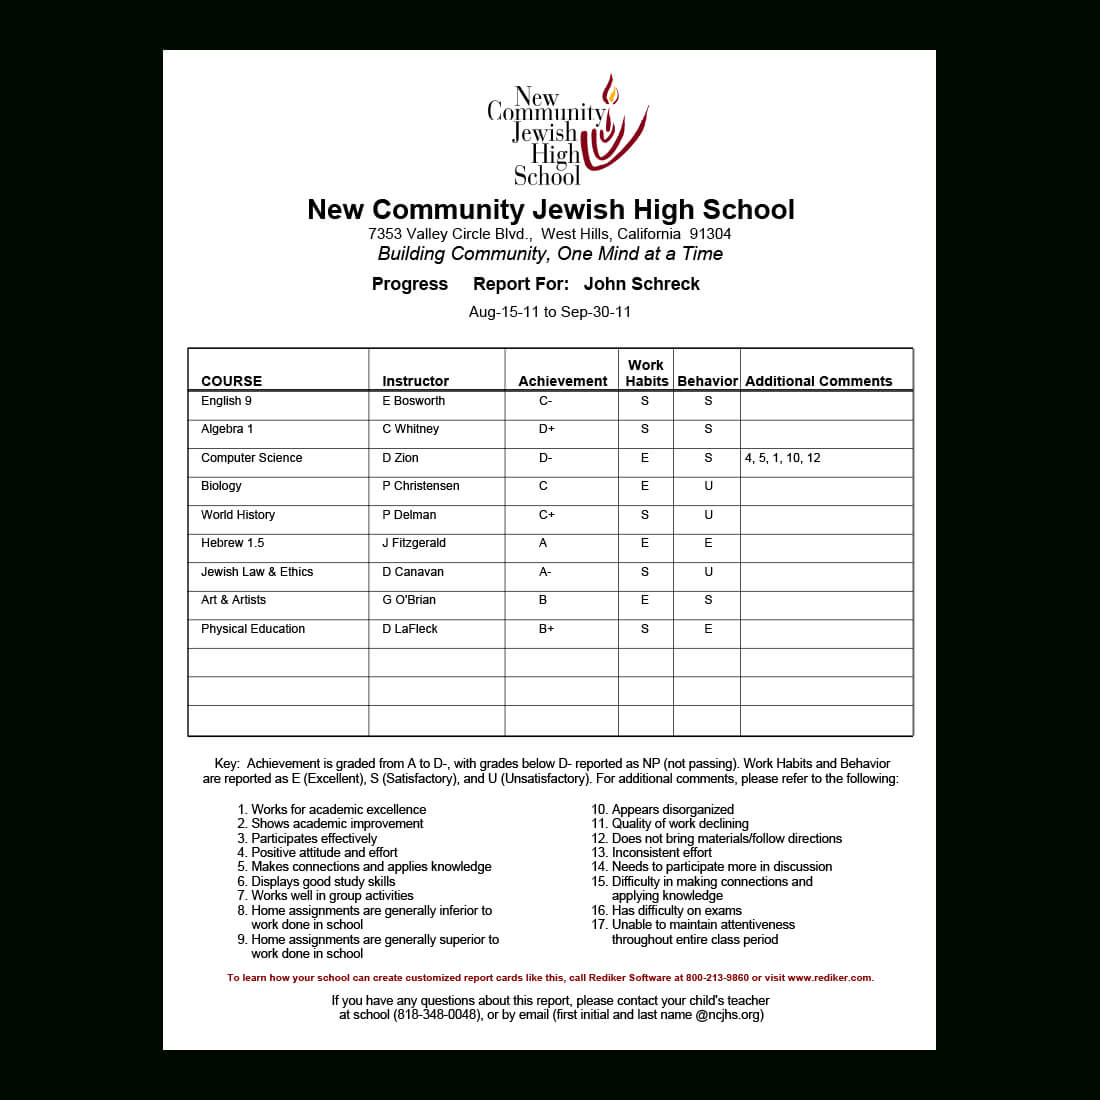 Report Card Software - Grade Management | Rediker Software In Summer School Progress Report Template